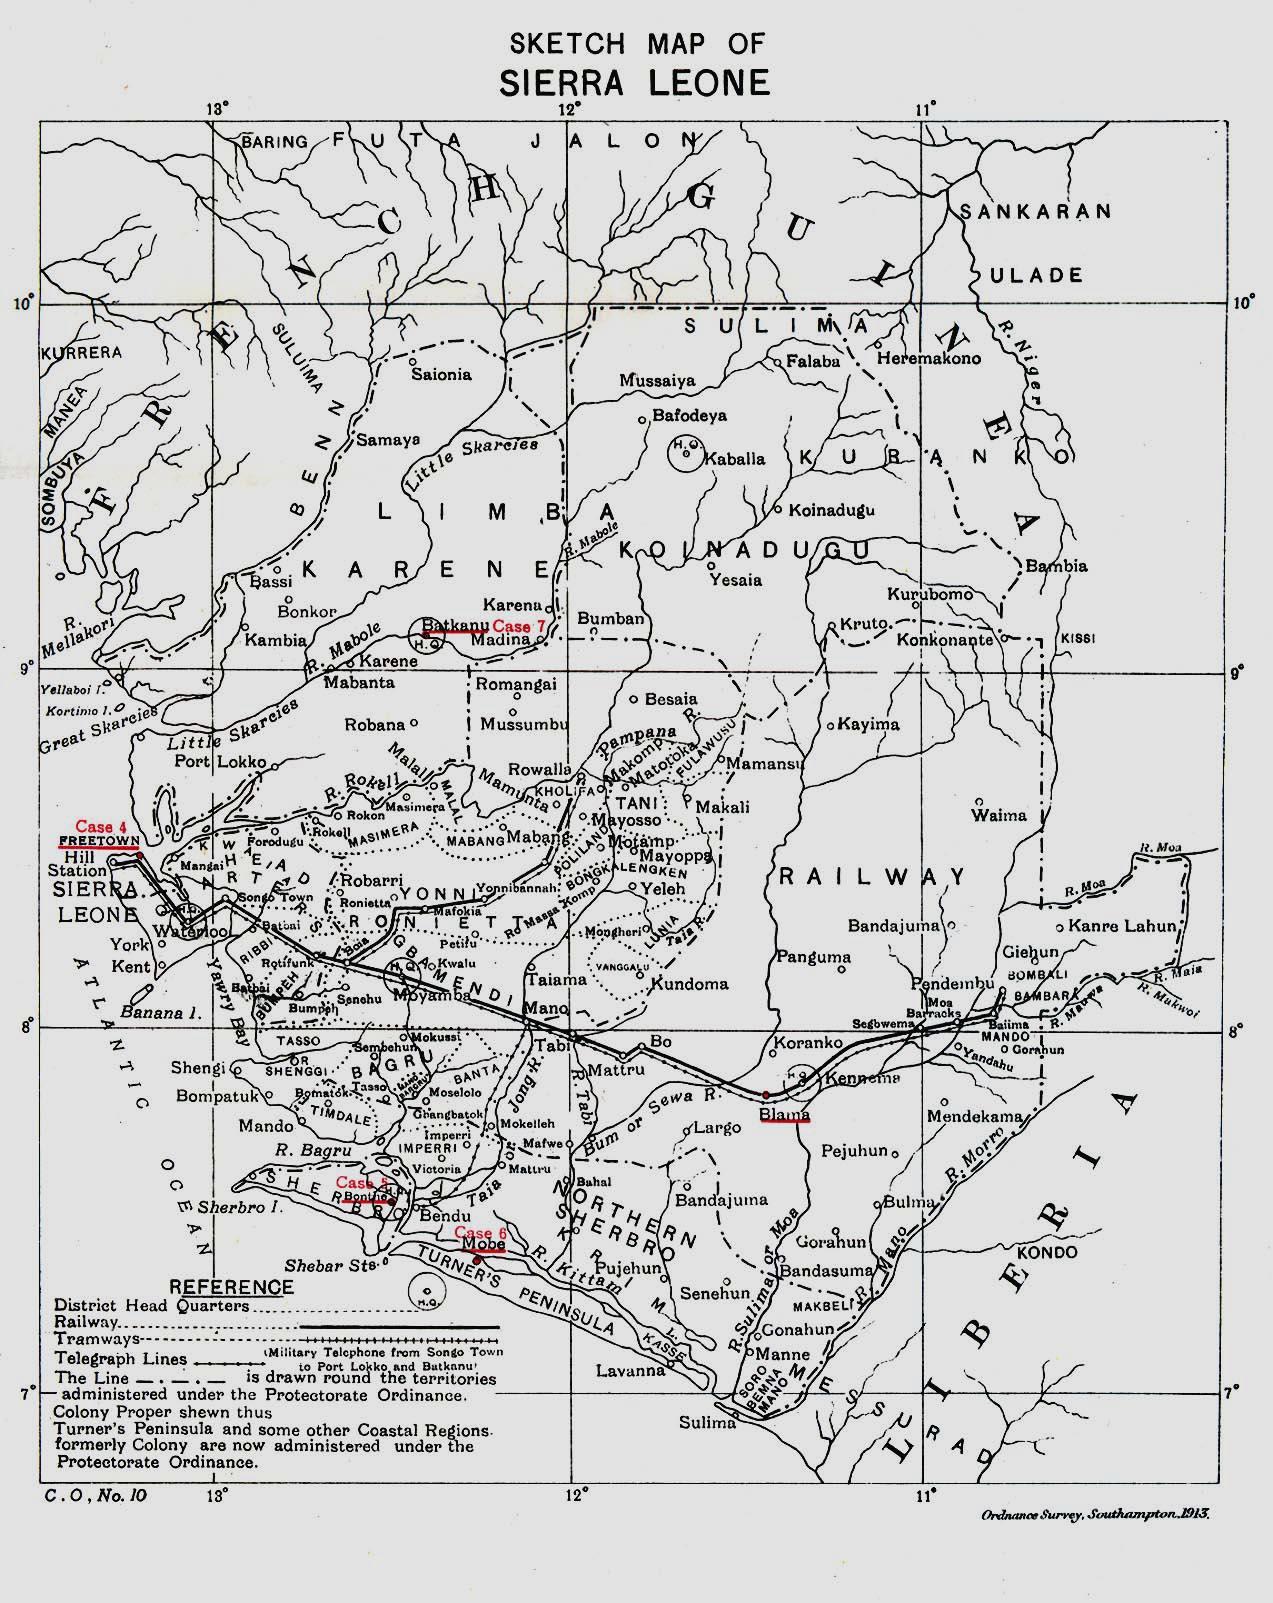 WHKMLA : History of Sierra Leone